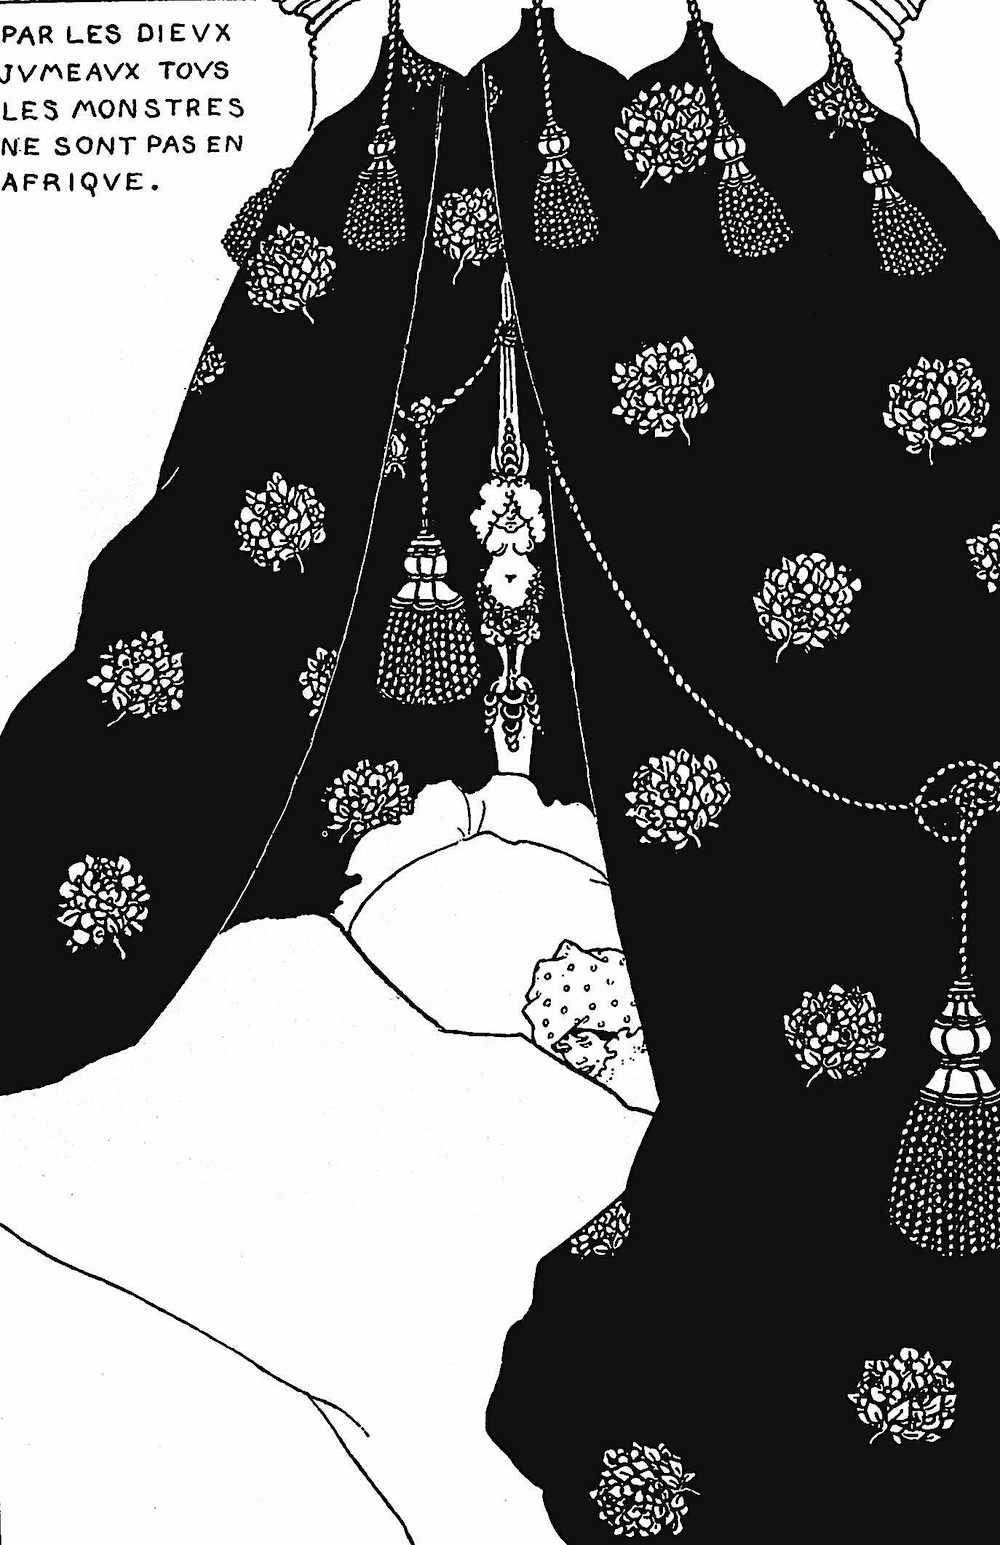 an Aubrey Beardsley illustration of illness and sleep